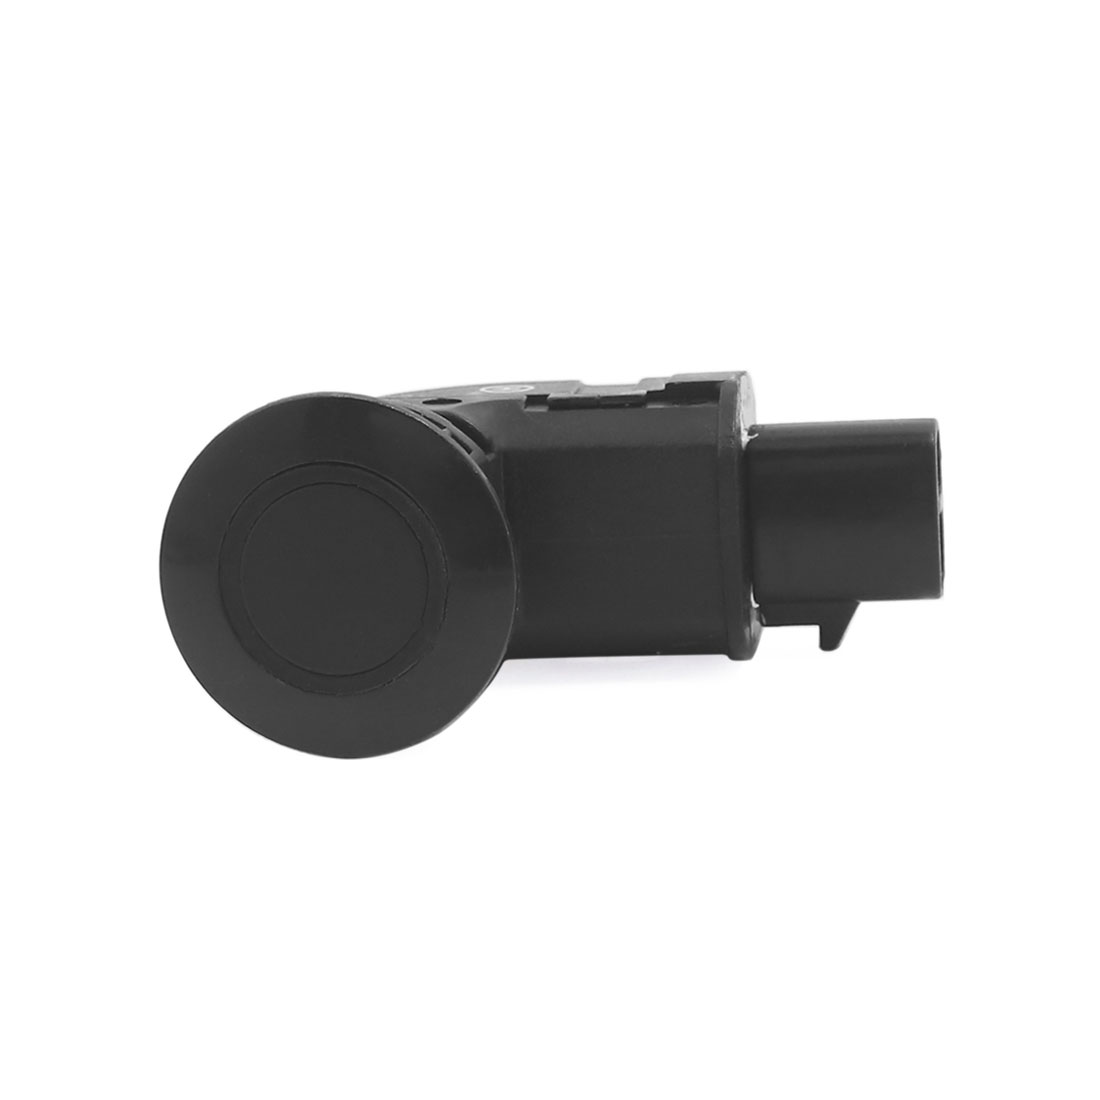 Black PDC Parking Sensors Reversing 89341-12041 Fits Toyota Camry Corolla